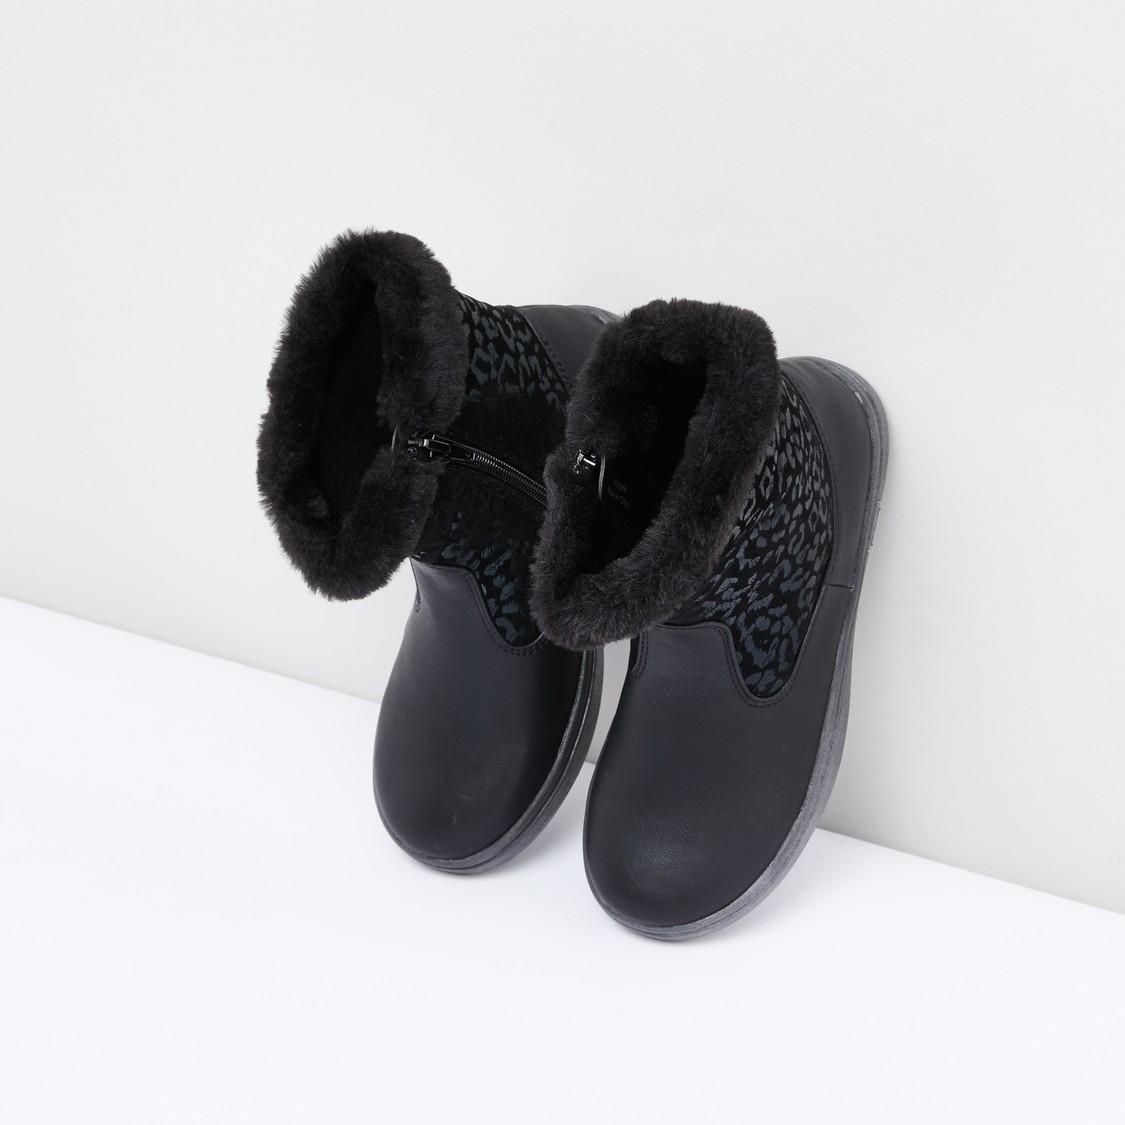 Textured Boots with Zip Closure